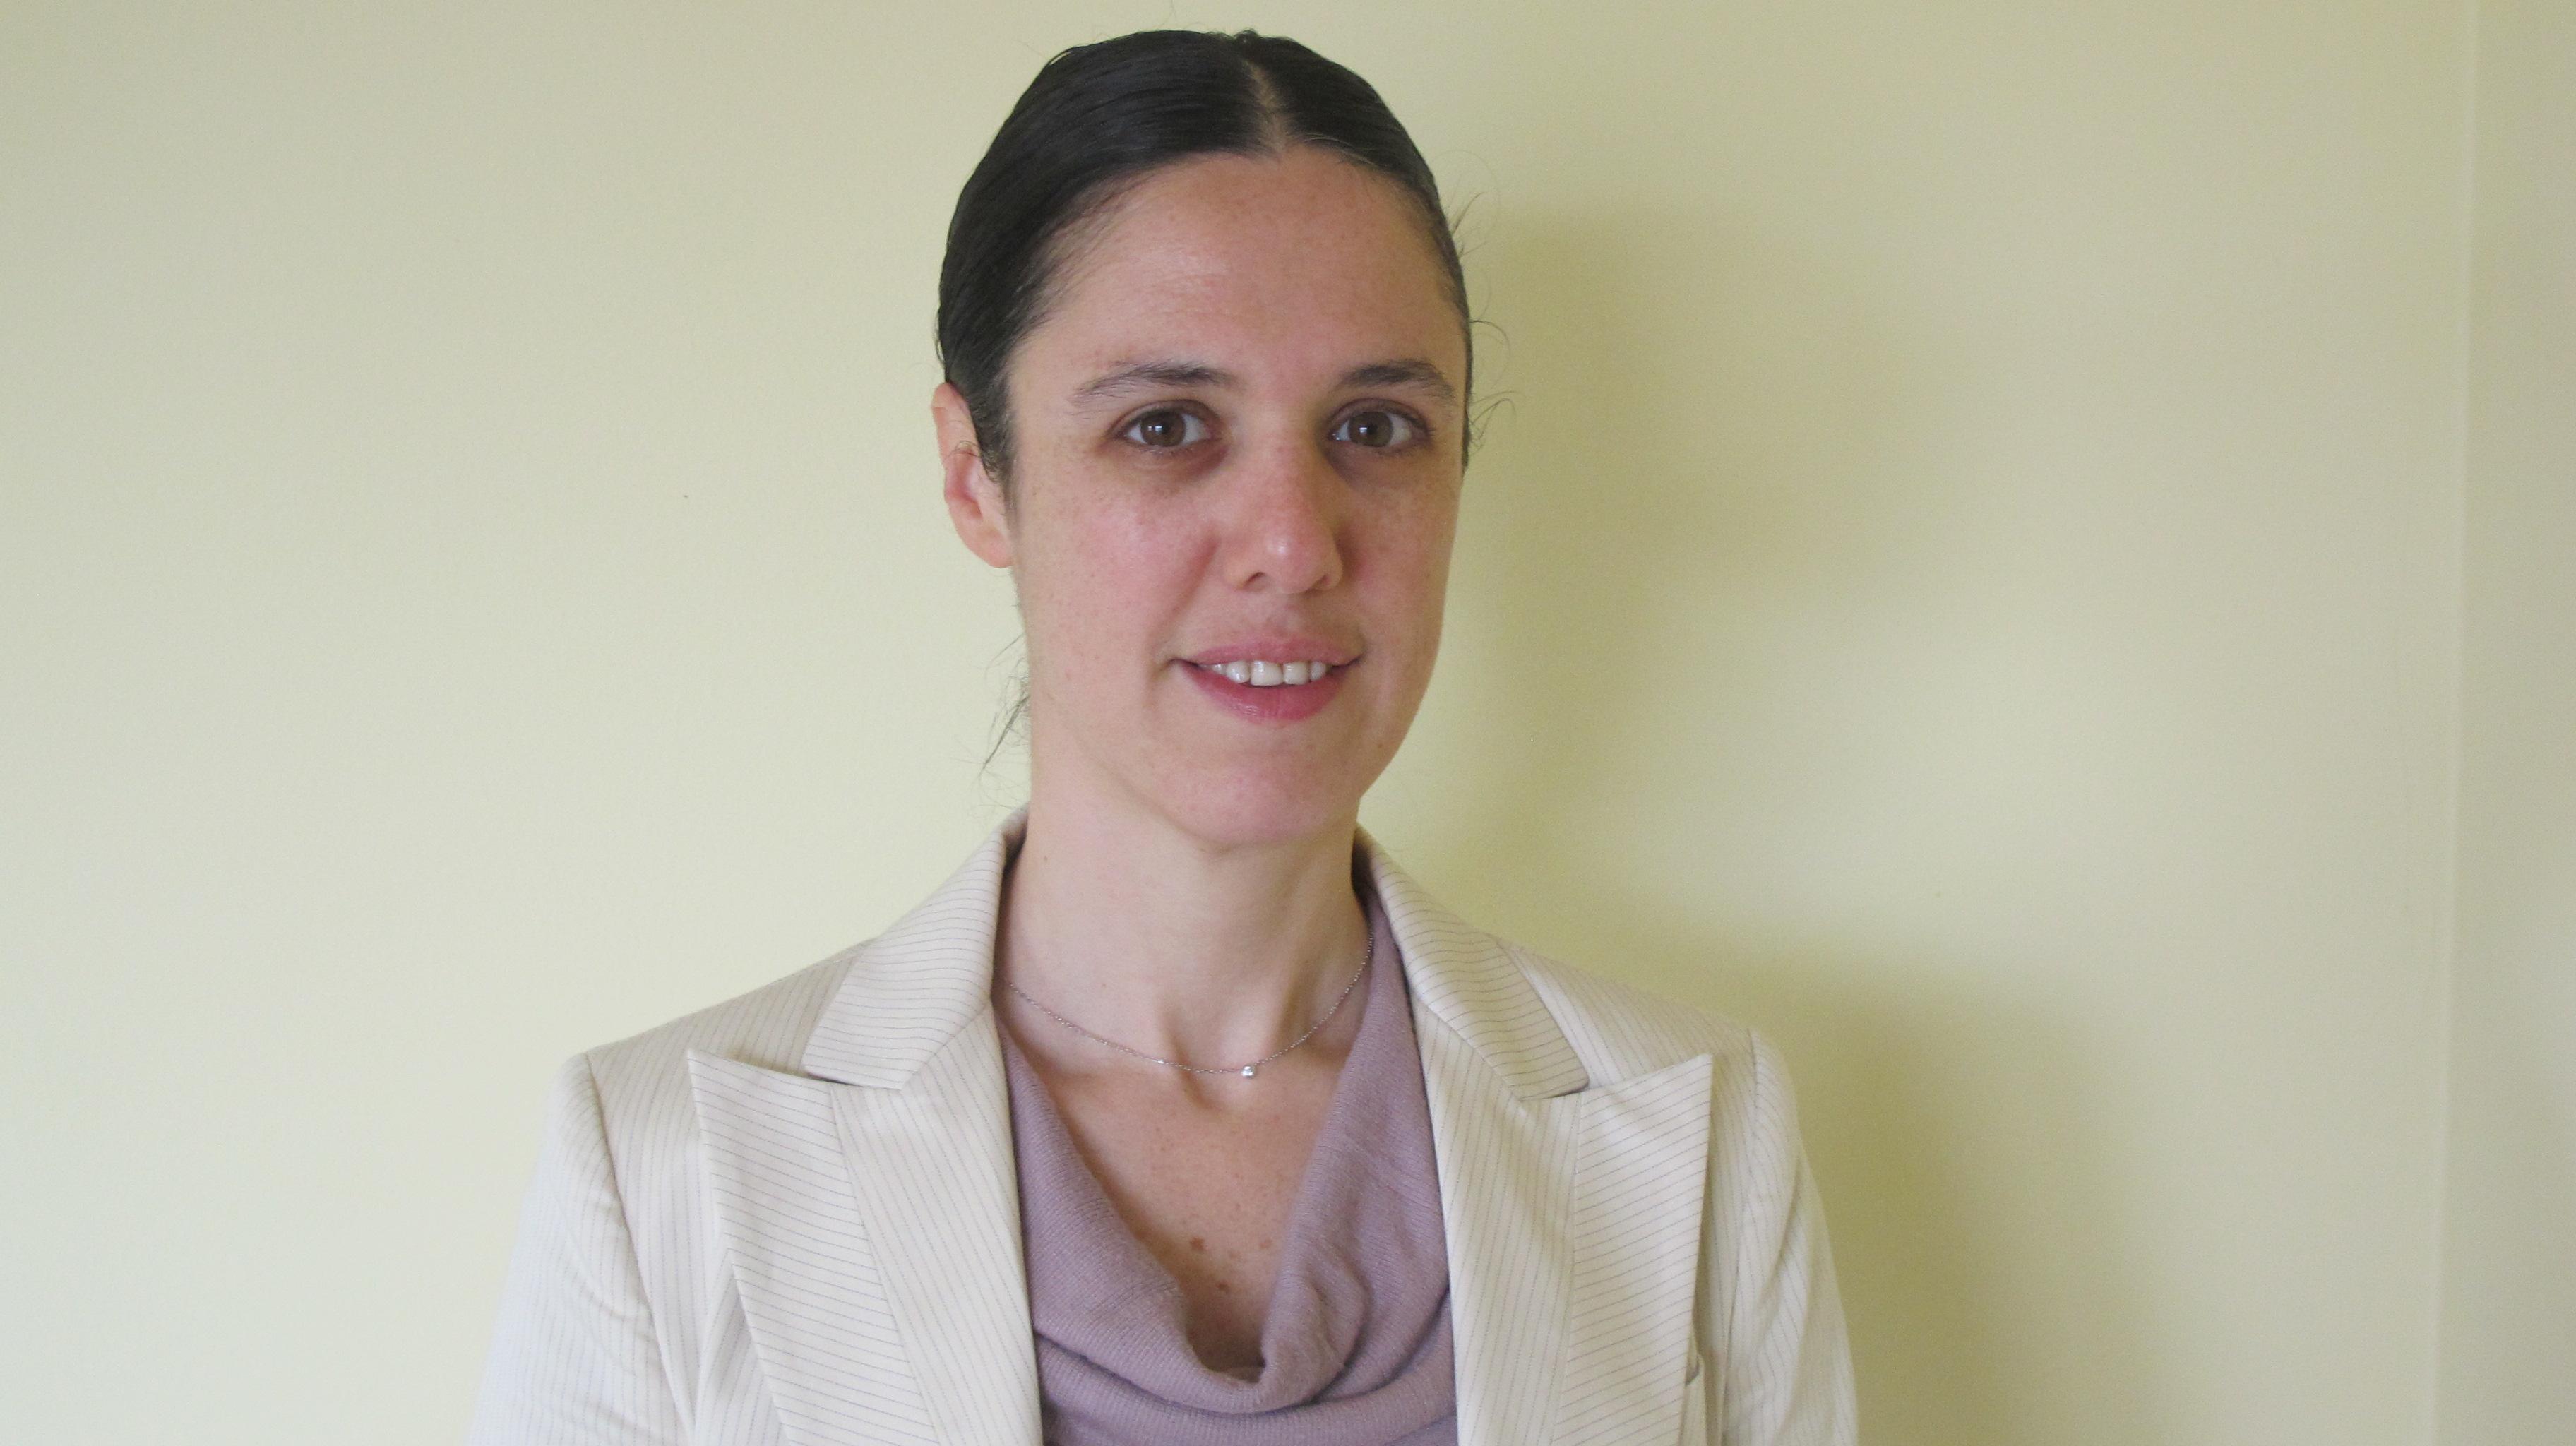 Peerlyst CEO Limor Elbaz